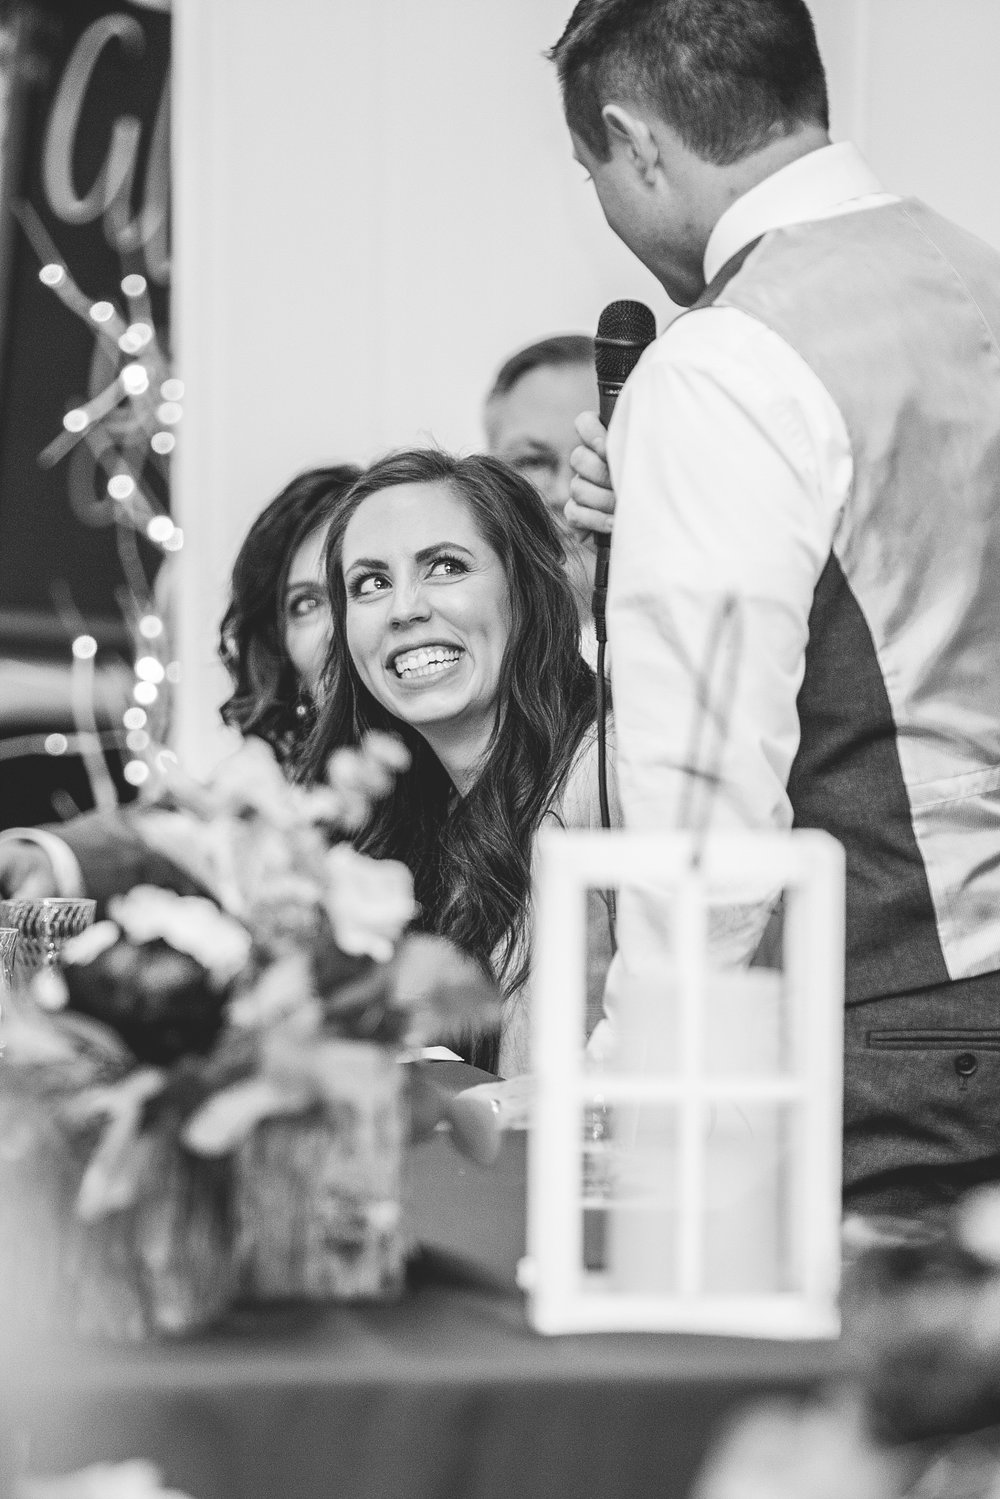 SS-Wedding-267BW_Lizzie-B-Imagery-Utah-Wedding-Photographer-Logan-Temple-Logan-Canyon-Mountain-Horse-Session.jpg